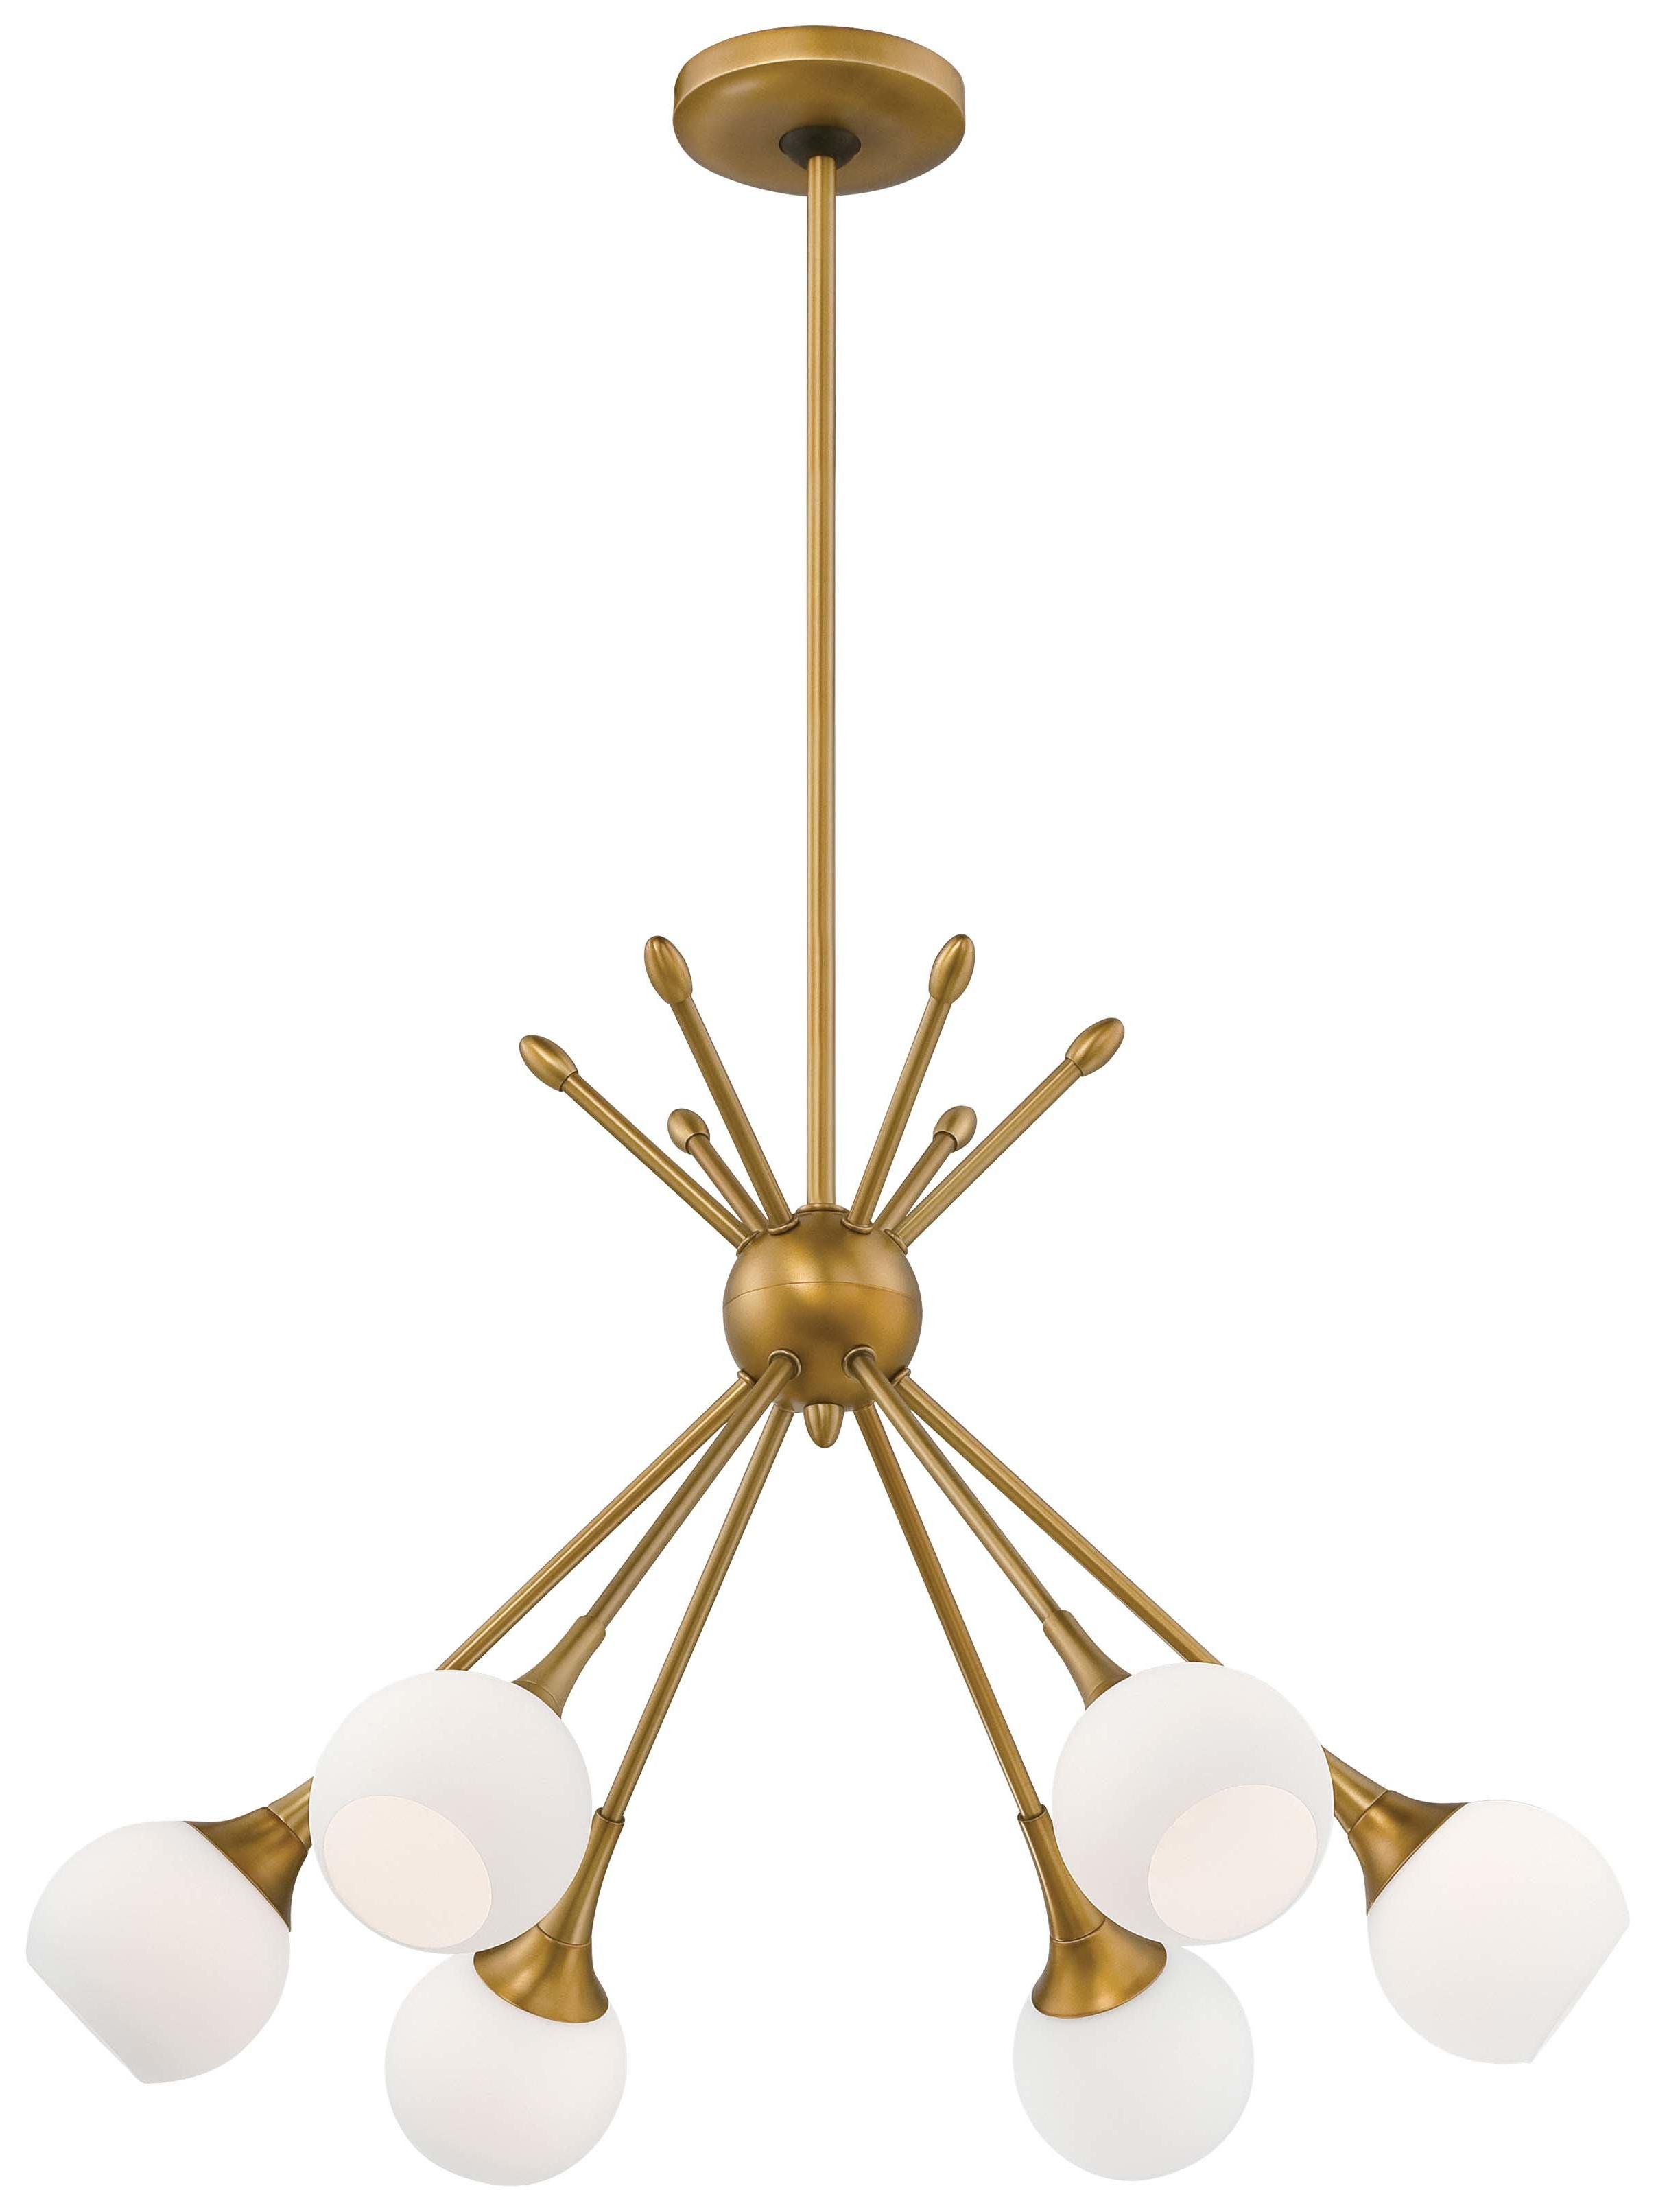 Featured Photo of Silvia 6 Light Sputnik Chandeliers